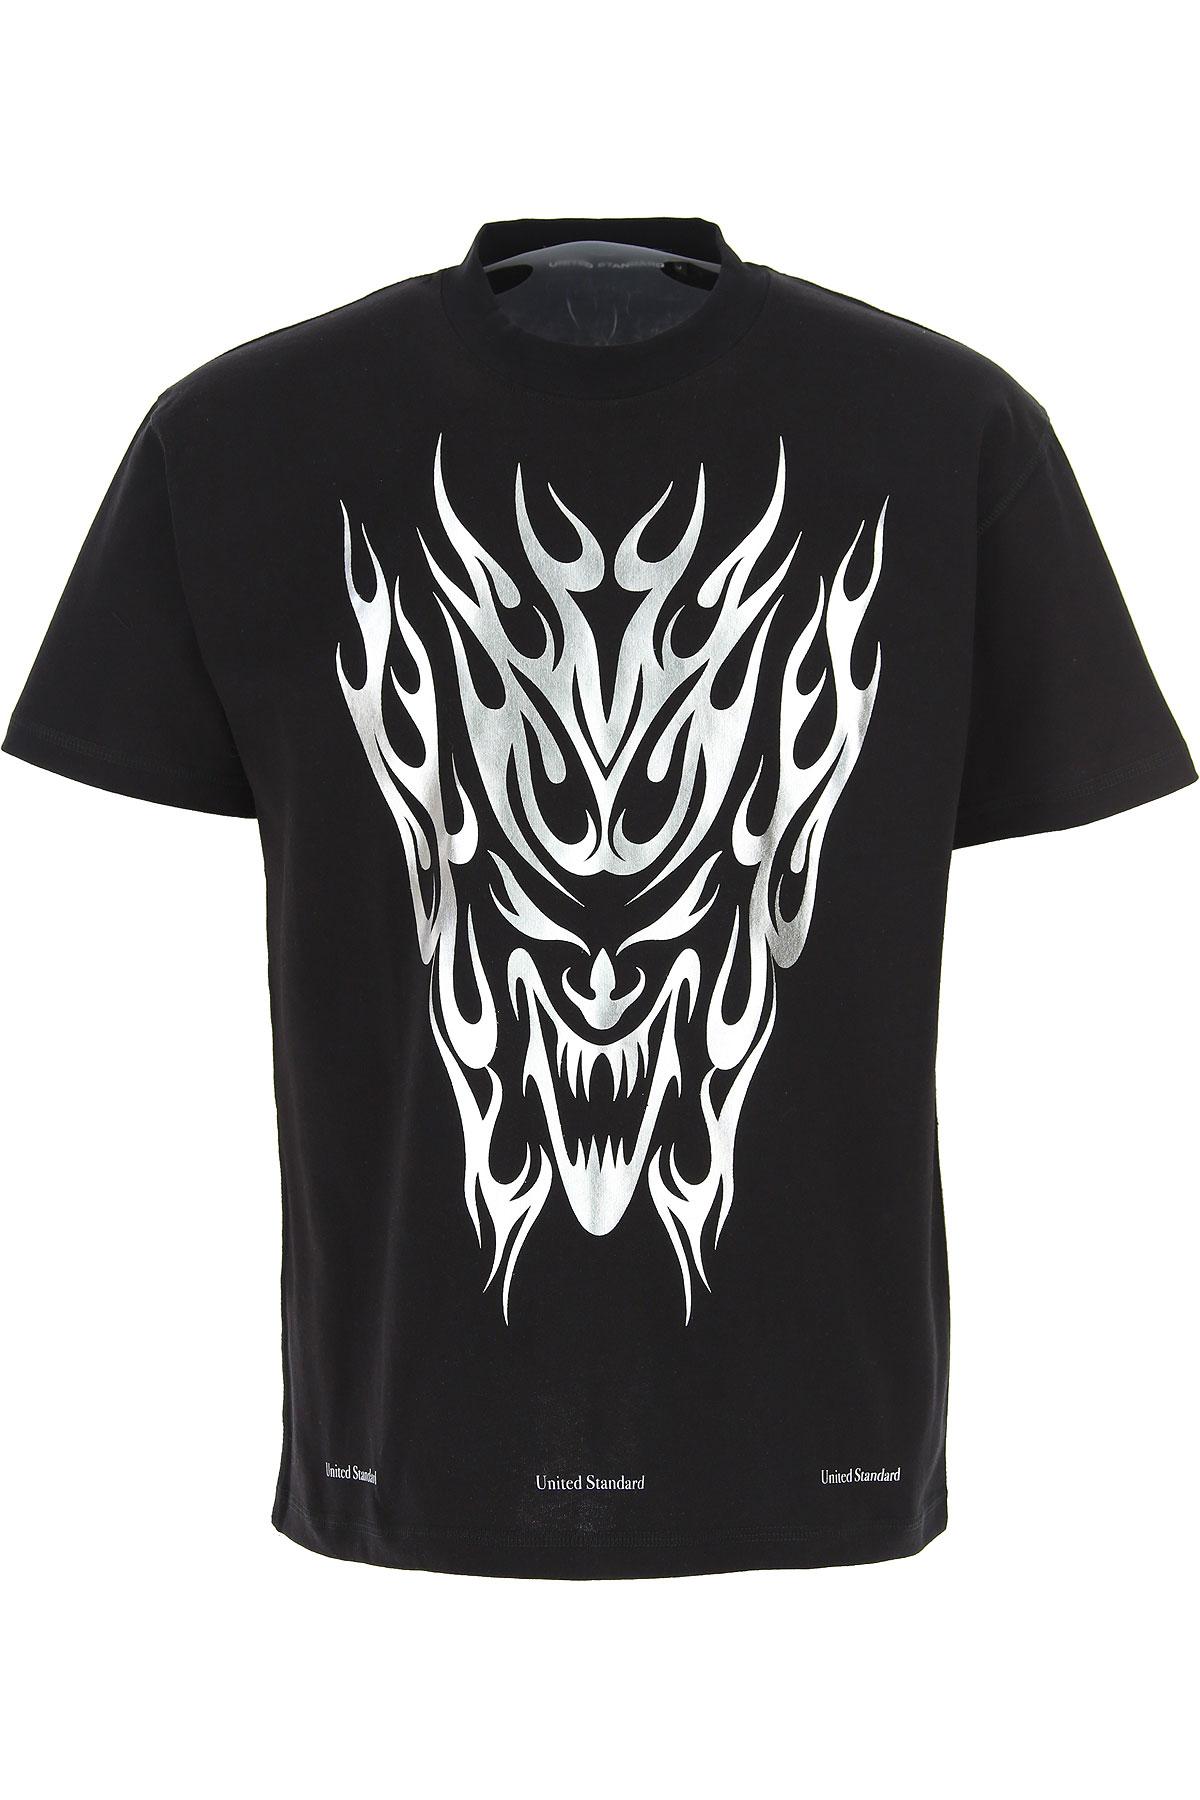 United Standard T-Shirt for Men On Sale, Black, Cotton, 2019, M S XL